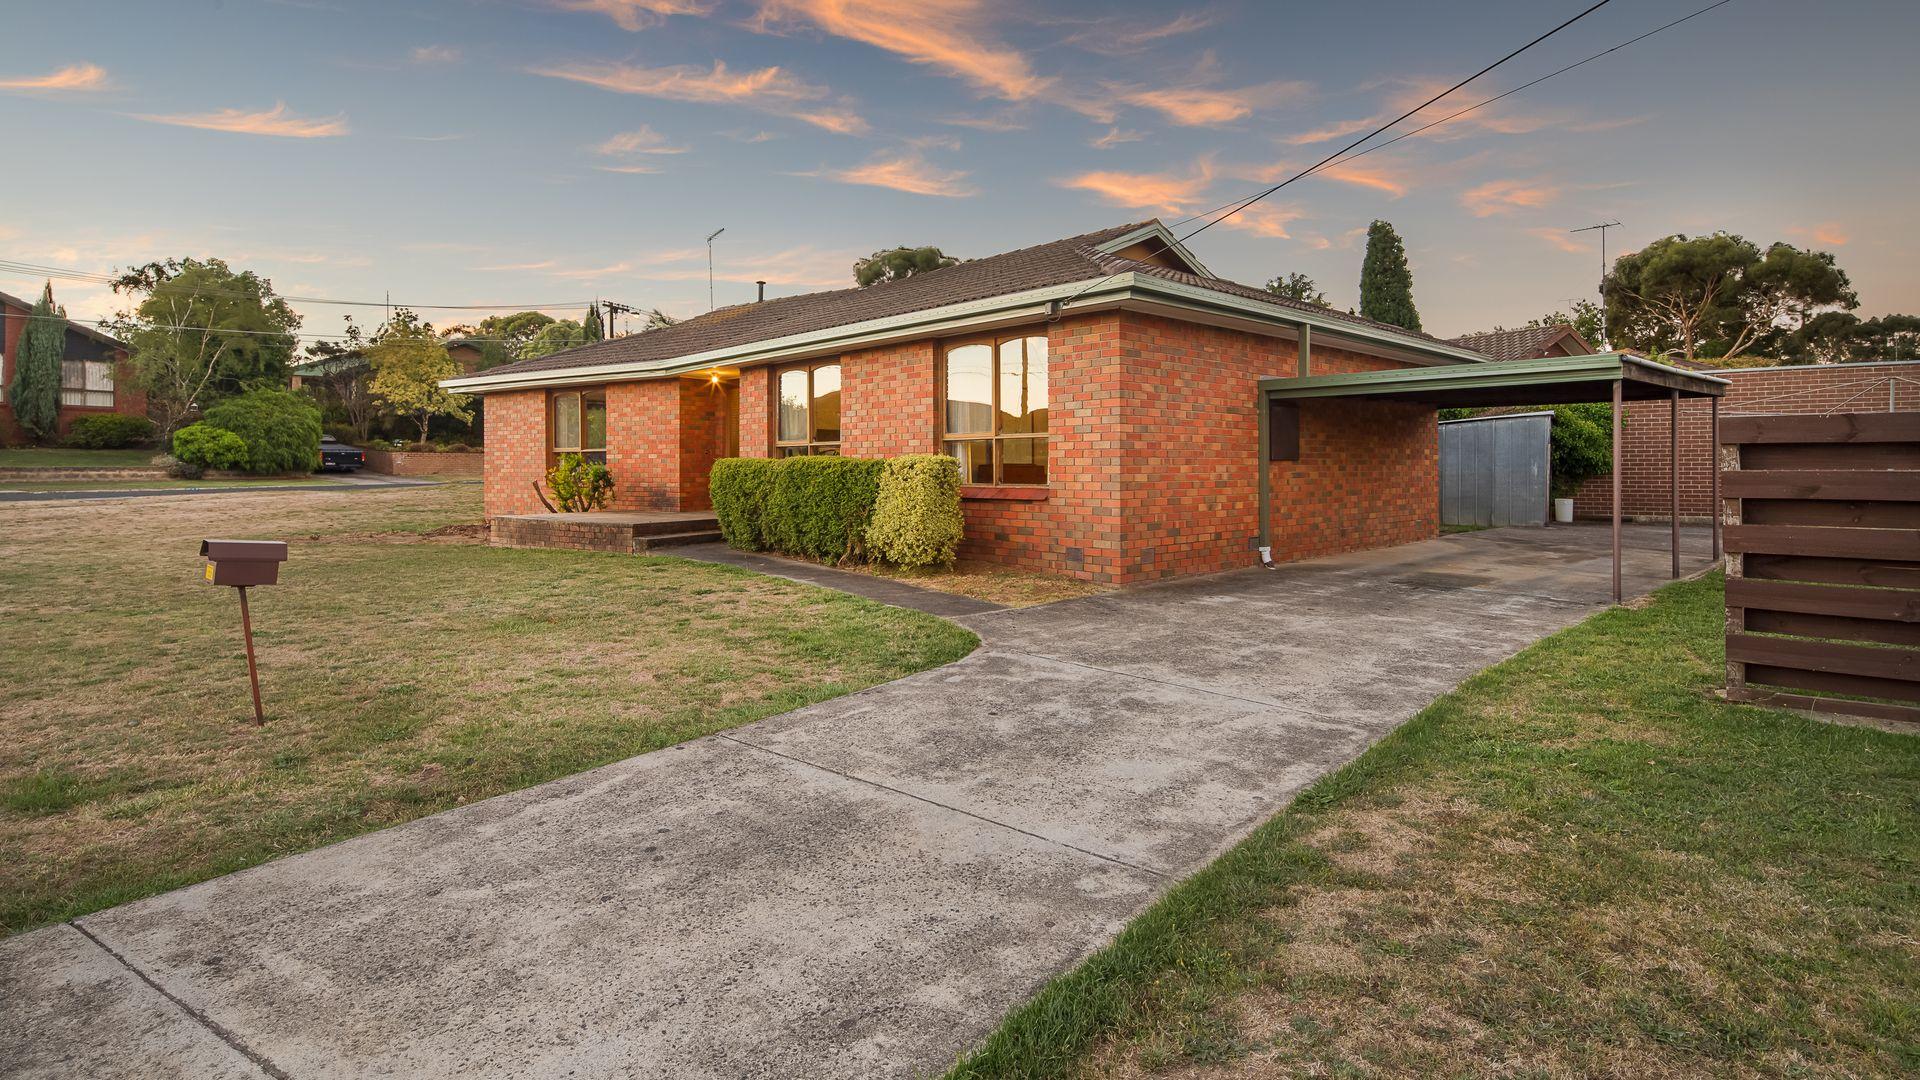 21 Kinnane Court, Ballarat North VIC 3350, Image 1